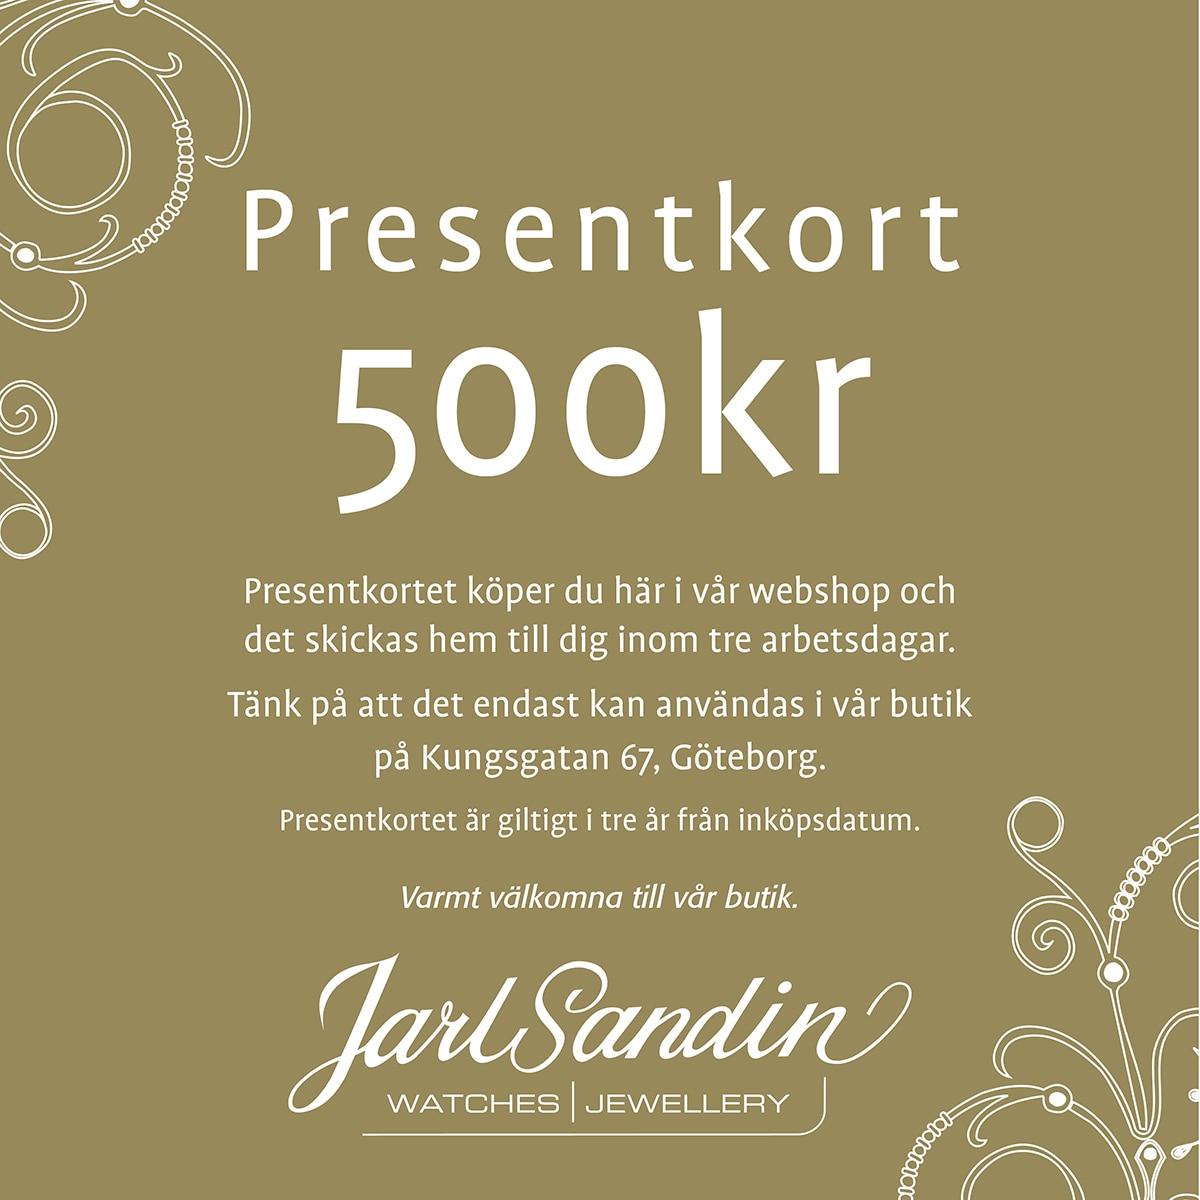 Presentkort_Jarl_Sandin_ 500kr